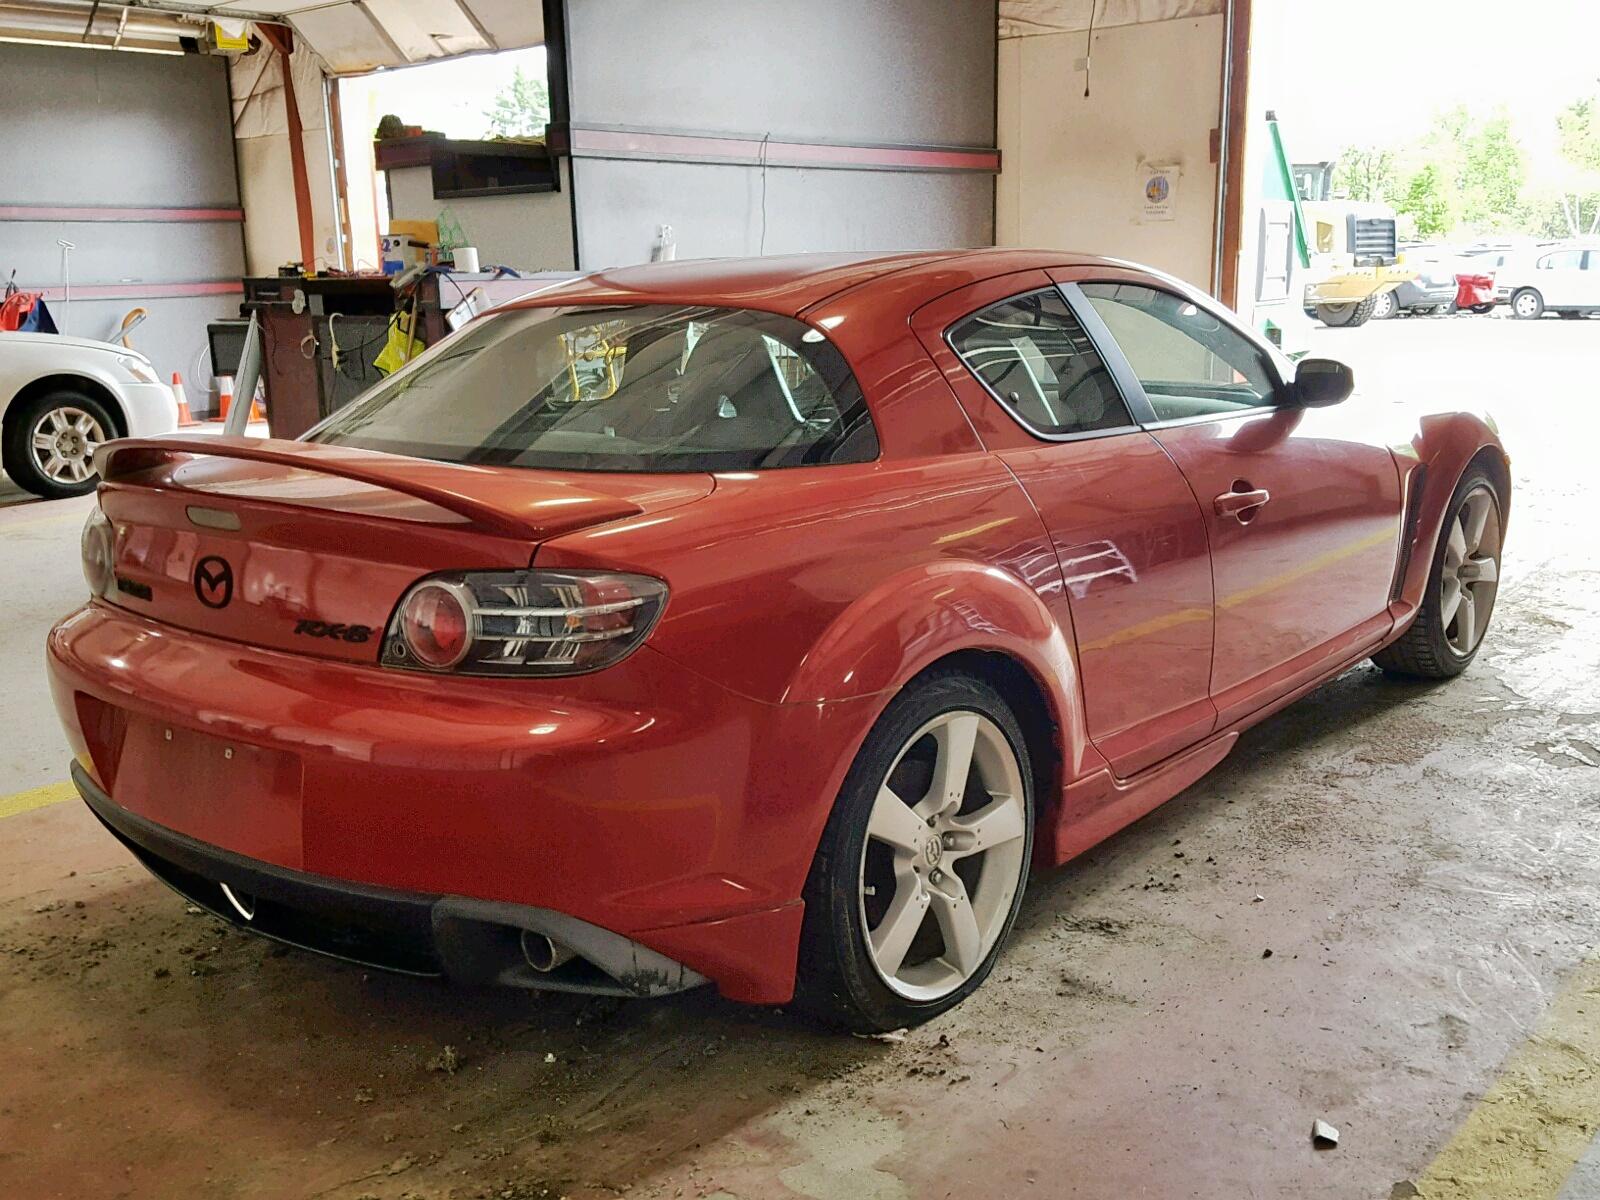 JM1FE173550158875 - 2005 Mazda Rx8 1.3L rear view